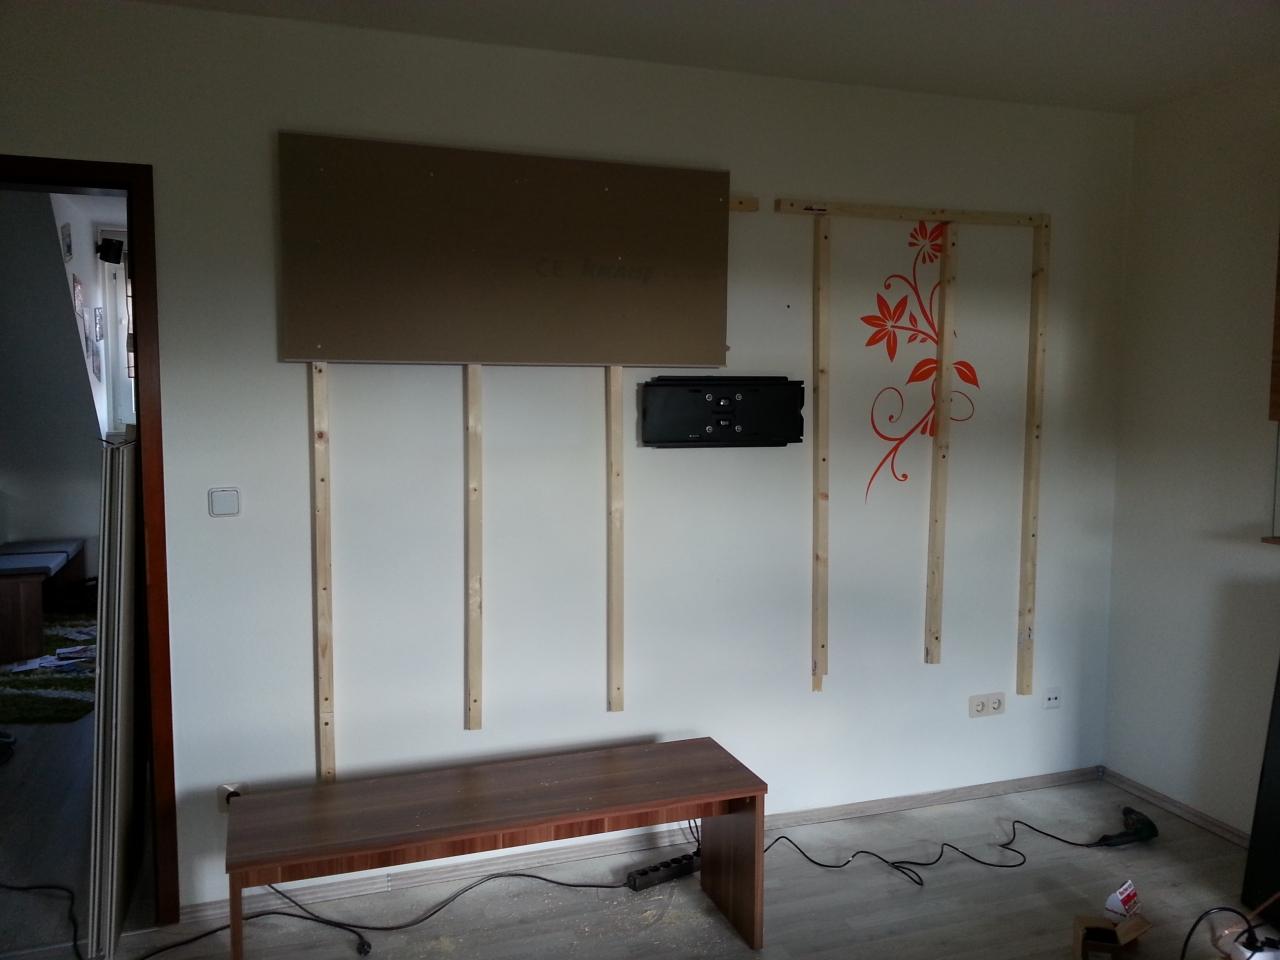 wohnwand / tv wand selbst gebaut - teil 1 - bauanleitung zum